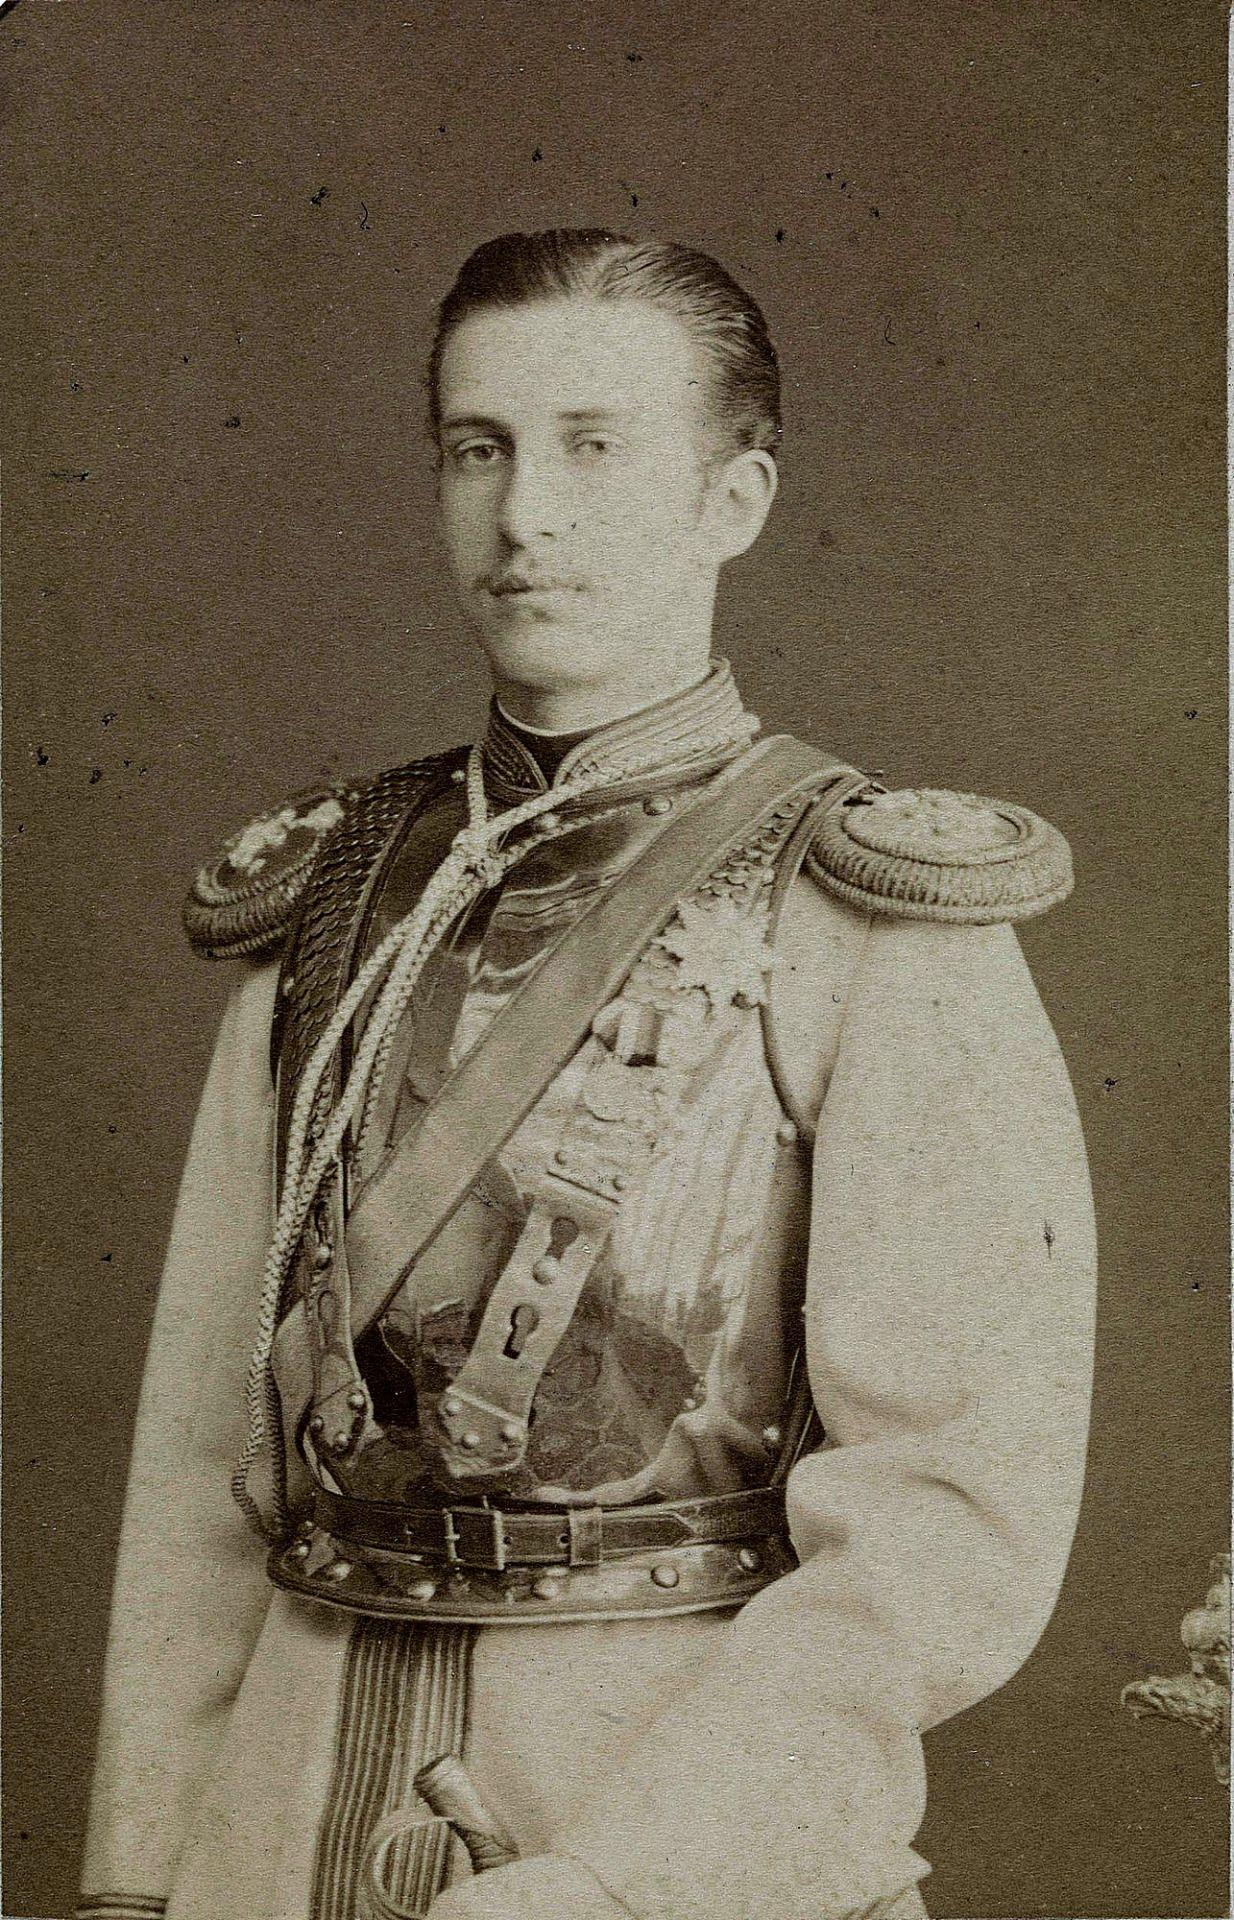 Grand Duke Nicholas Konstantinovich of Russia